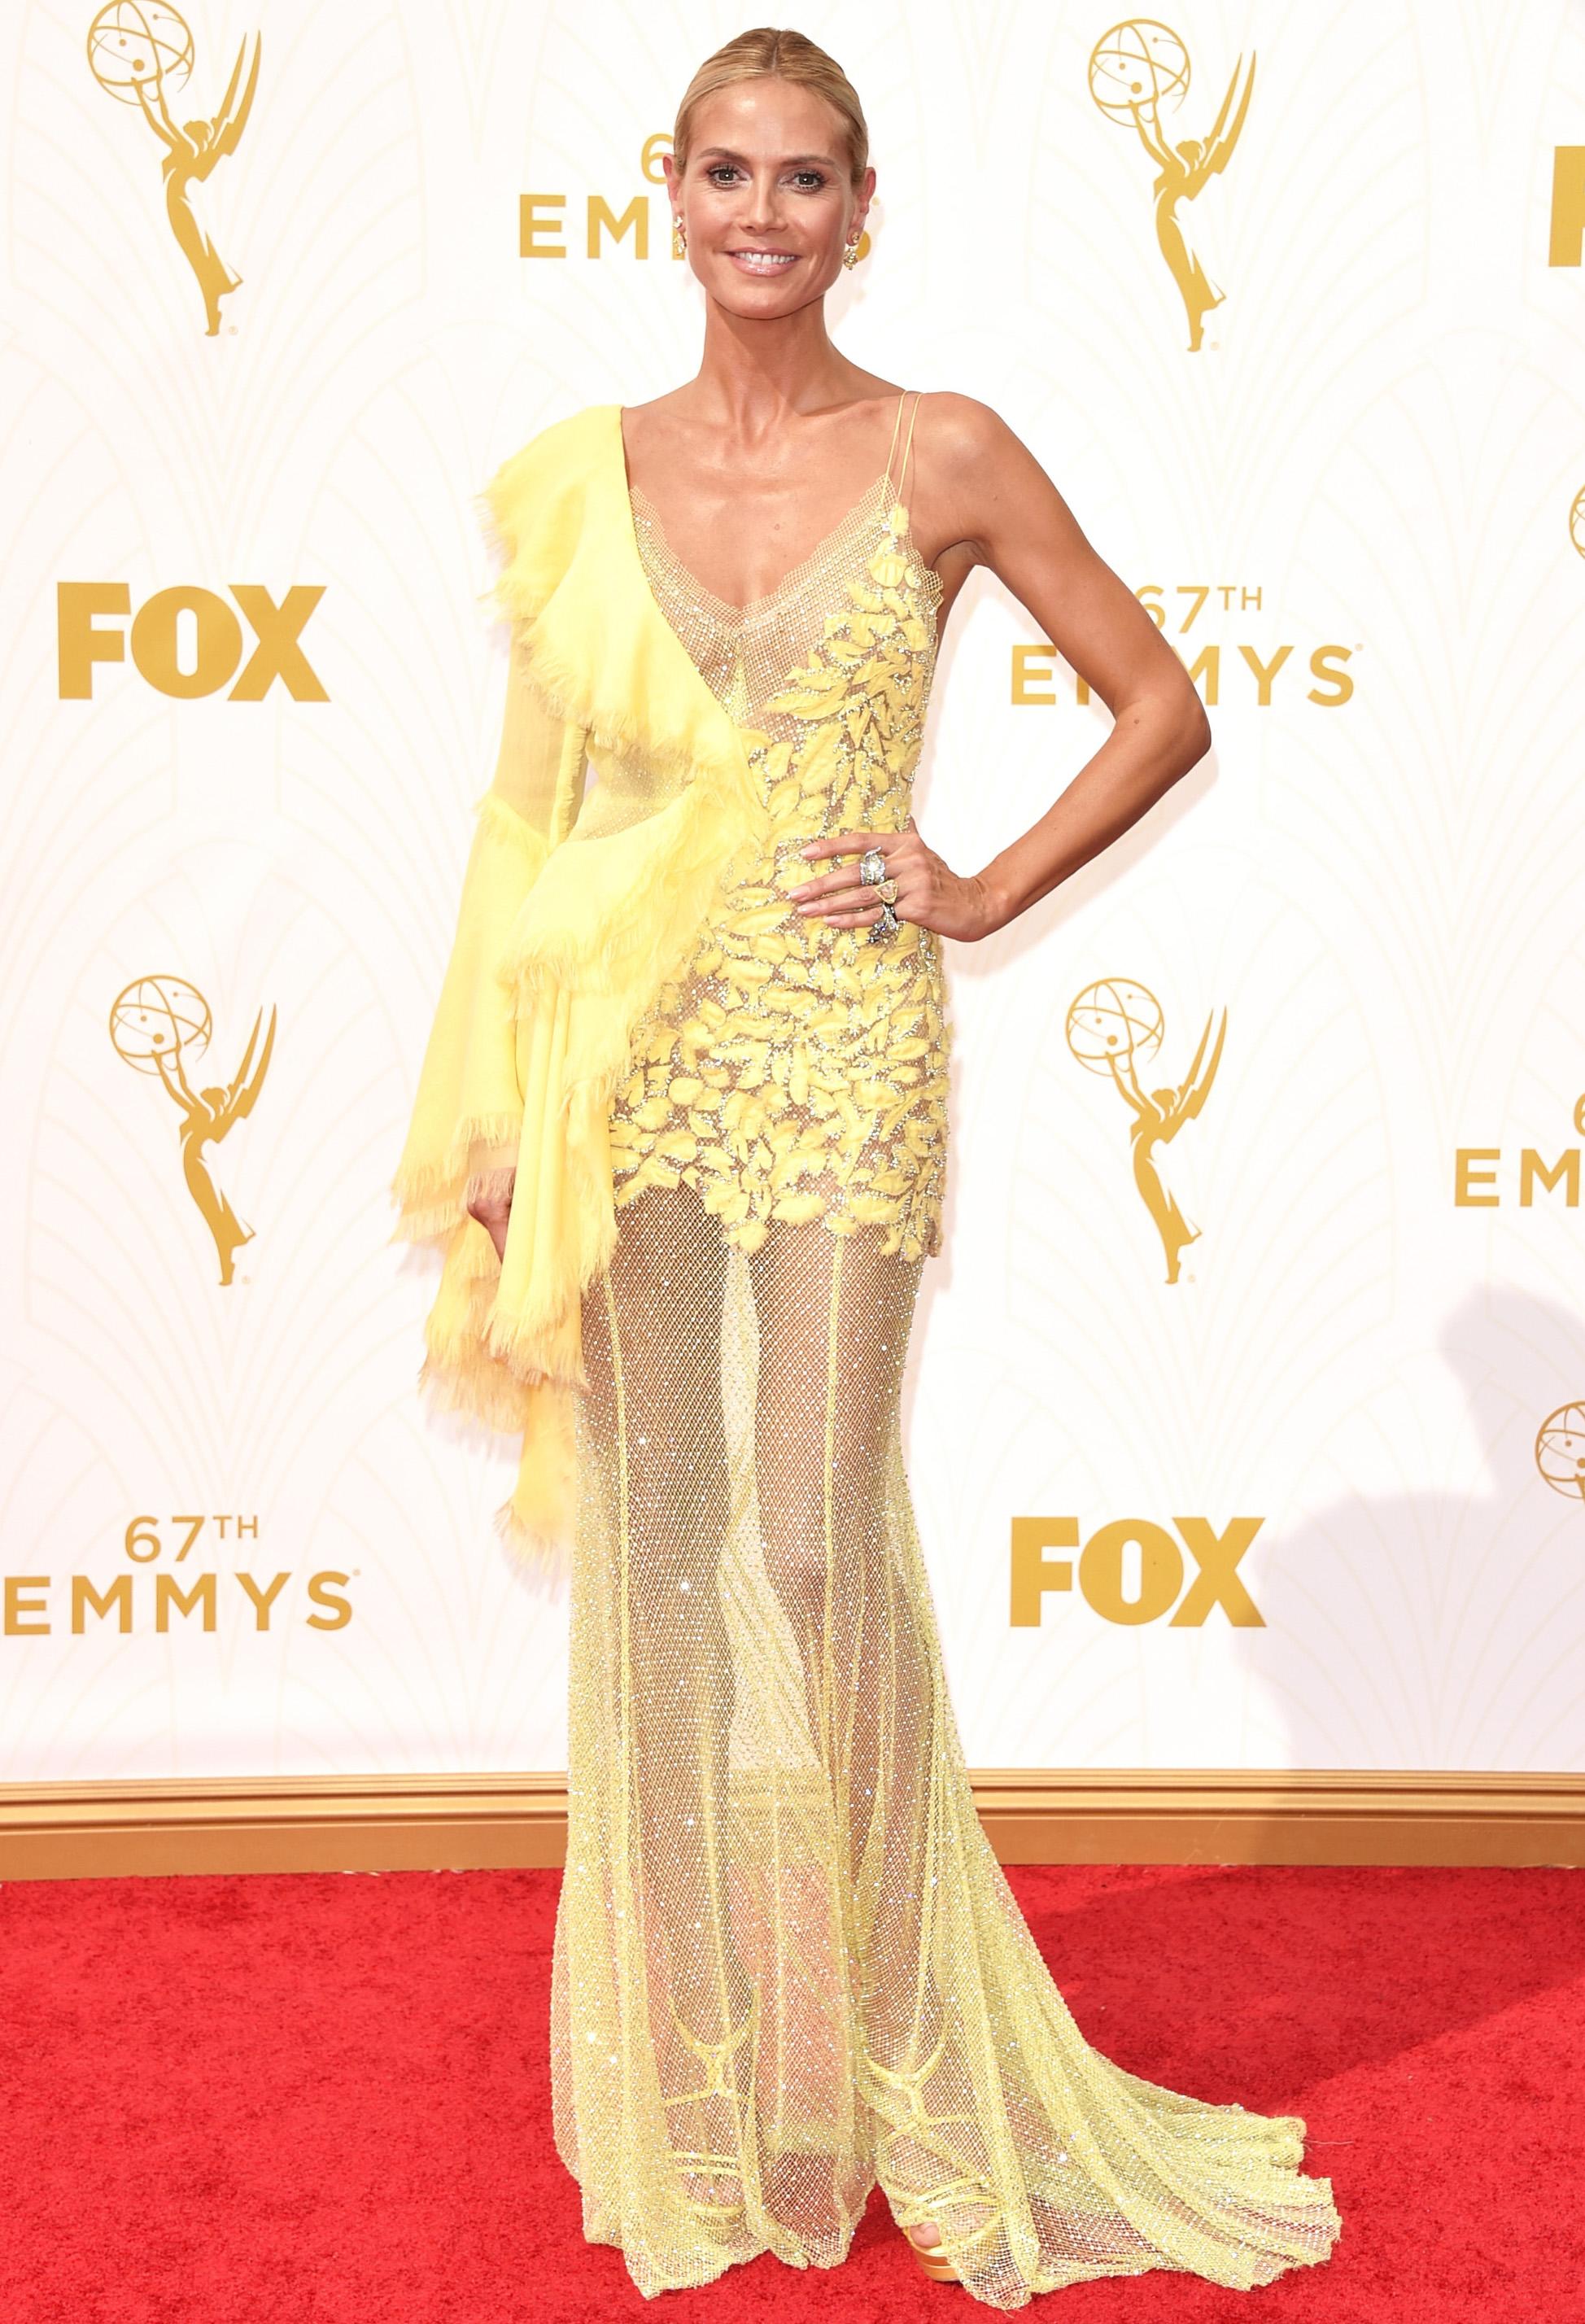 Heidi Klum at the 2015 Emmys